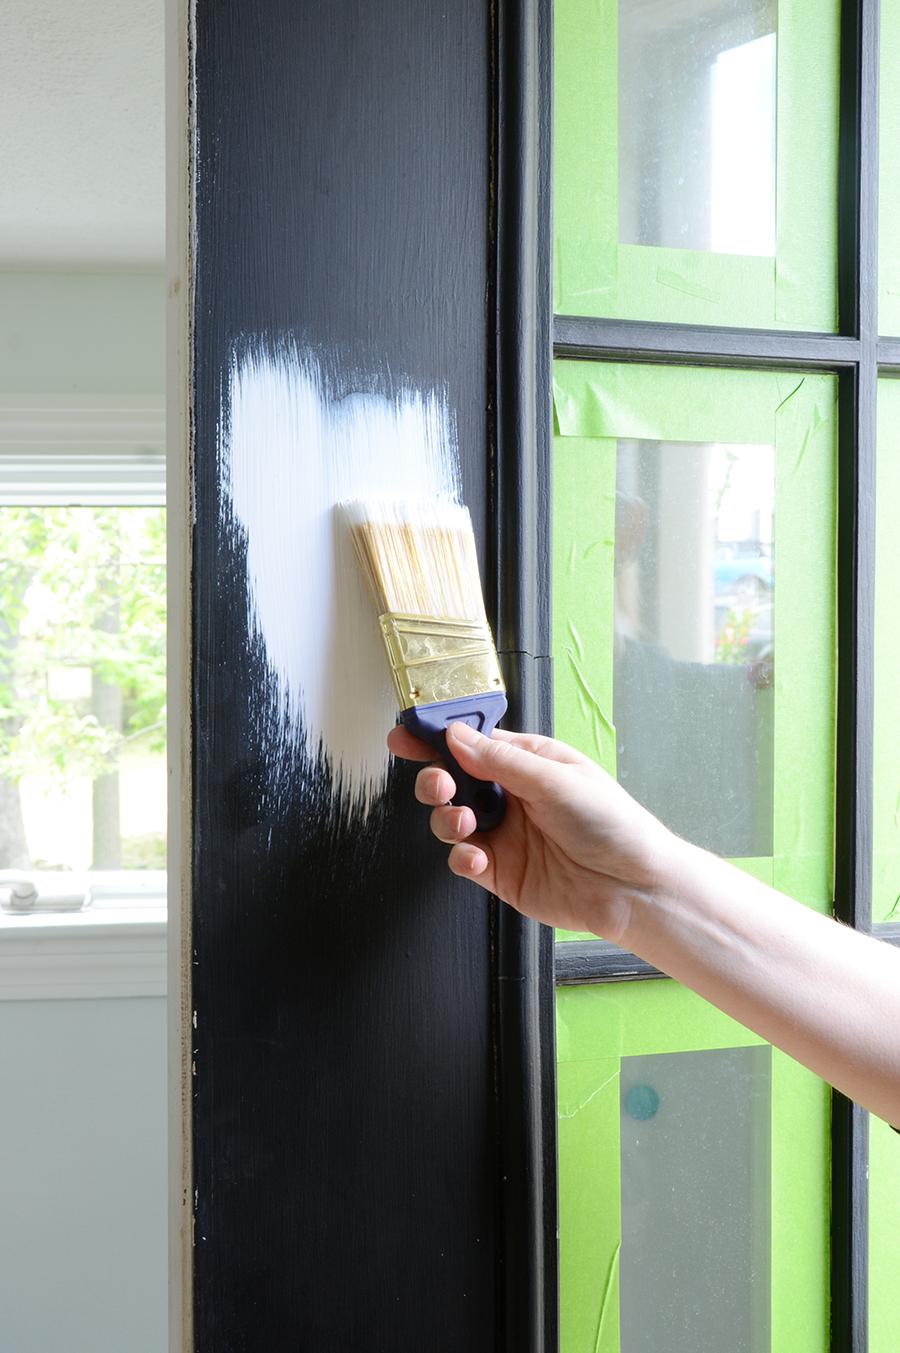 How to paint an exterior door coat of white primer